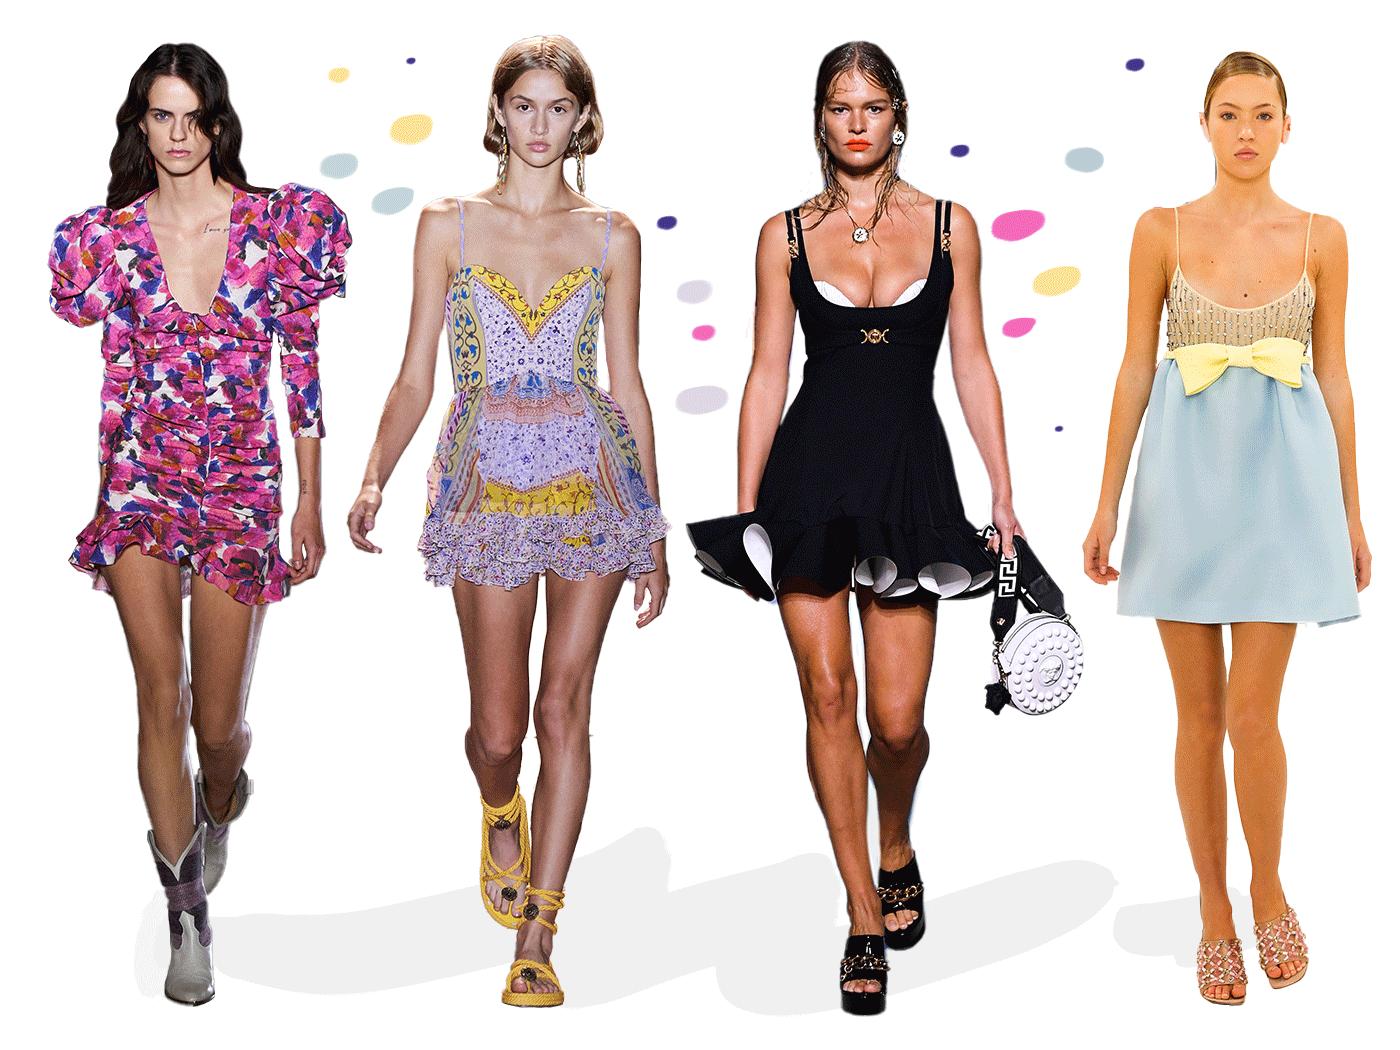 Mini φορέματα: Έφτασε η εποχή να αναδείξεις τα υπέροχα πόδια σου